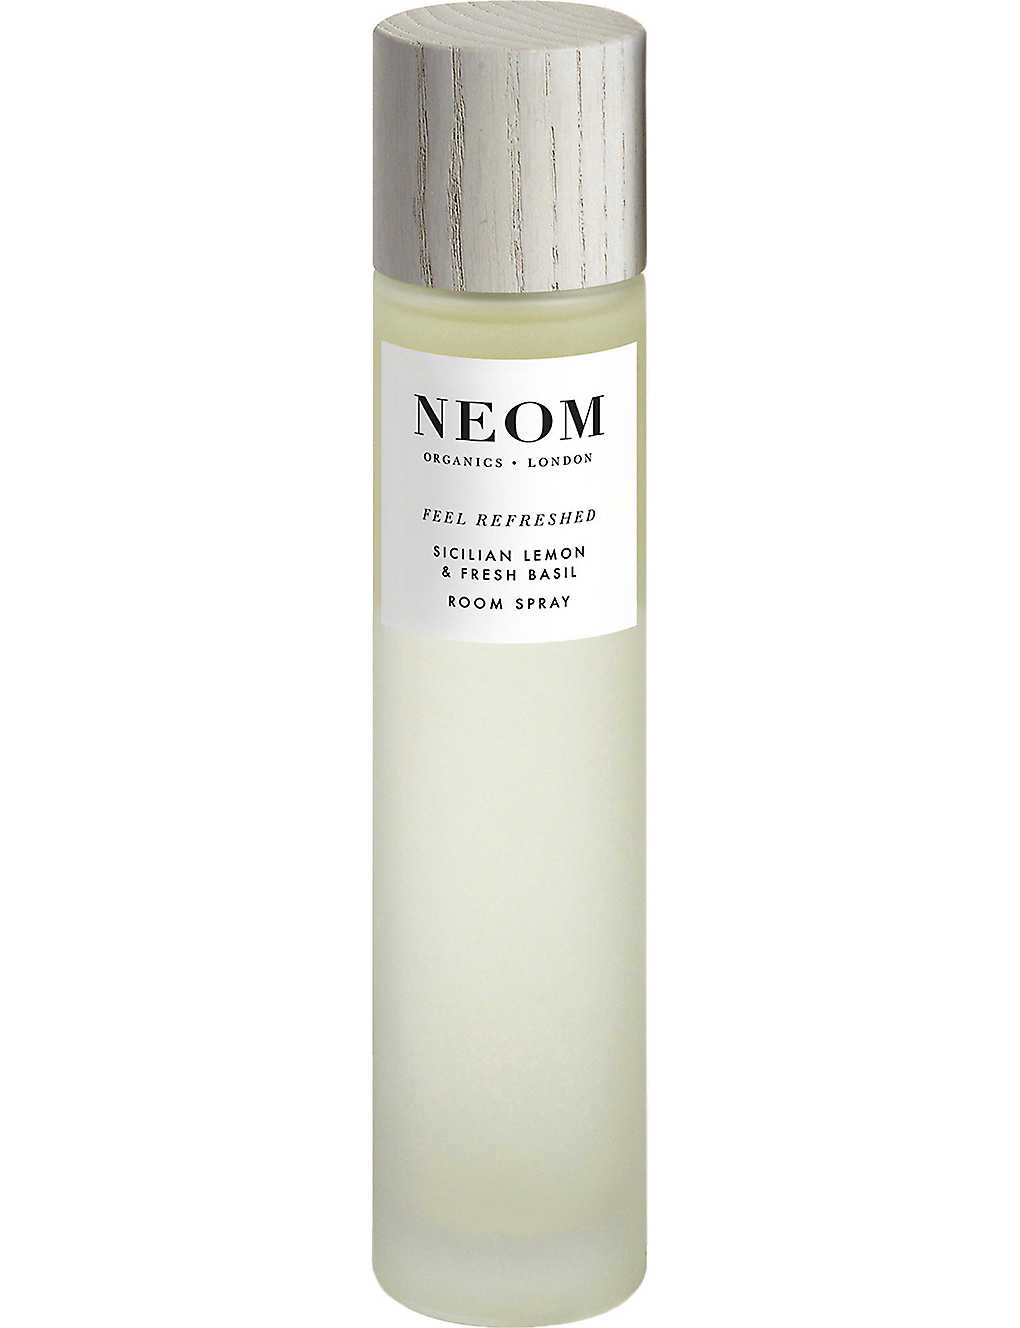 Neom Luxury Organics Feel Refreshed Room Spray 100ml Lem 401 No Recent Searches